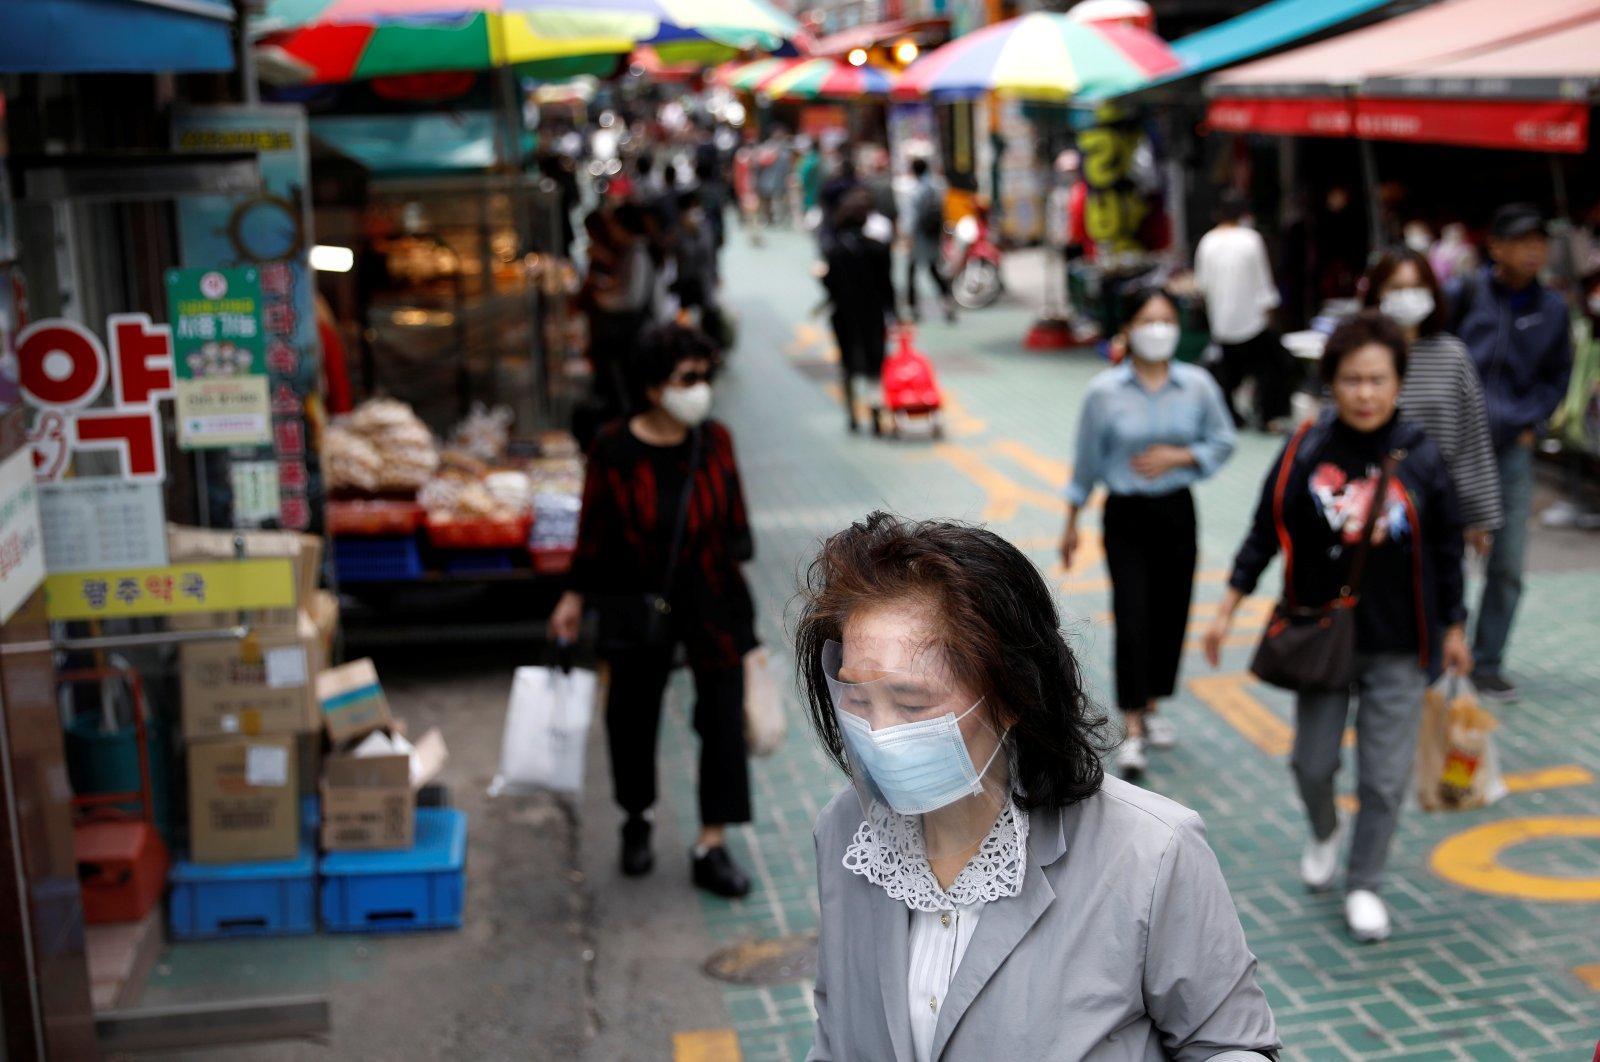 People wear masks to avoid the spread of the coronavirus, Seoul, South Korea, May 28, 2020. (Reuters Photo)